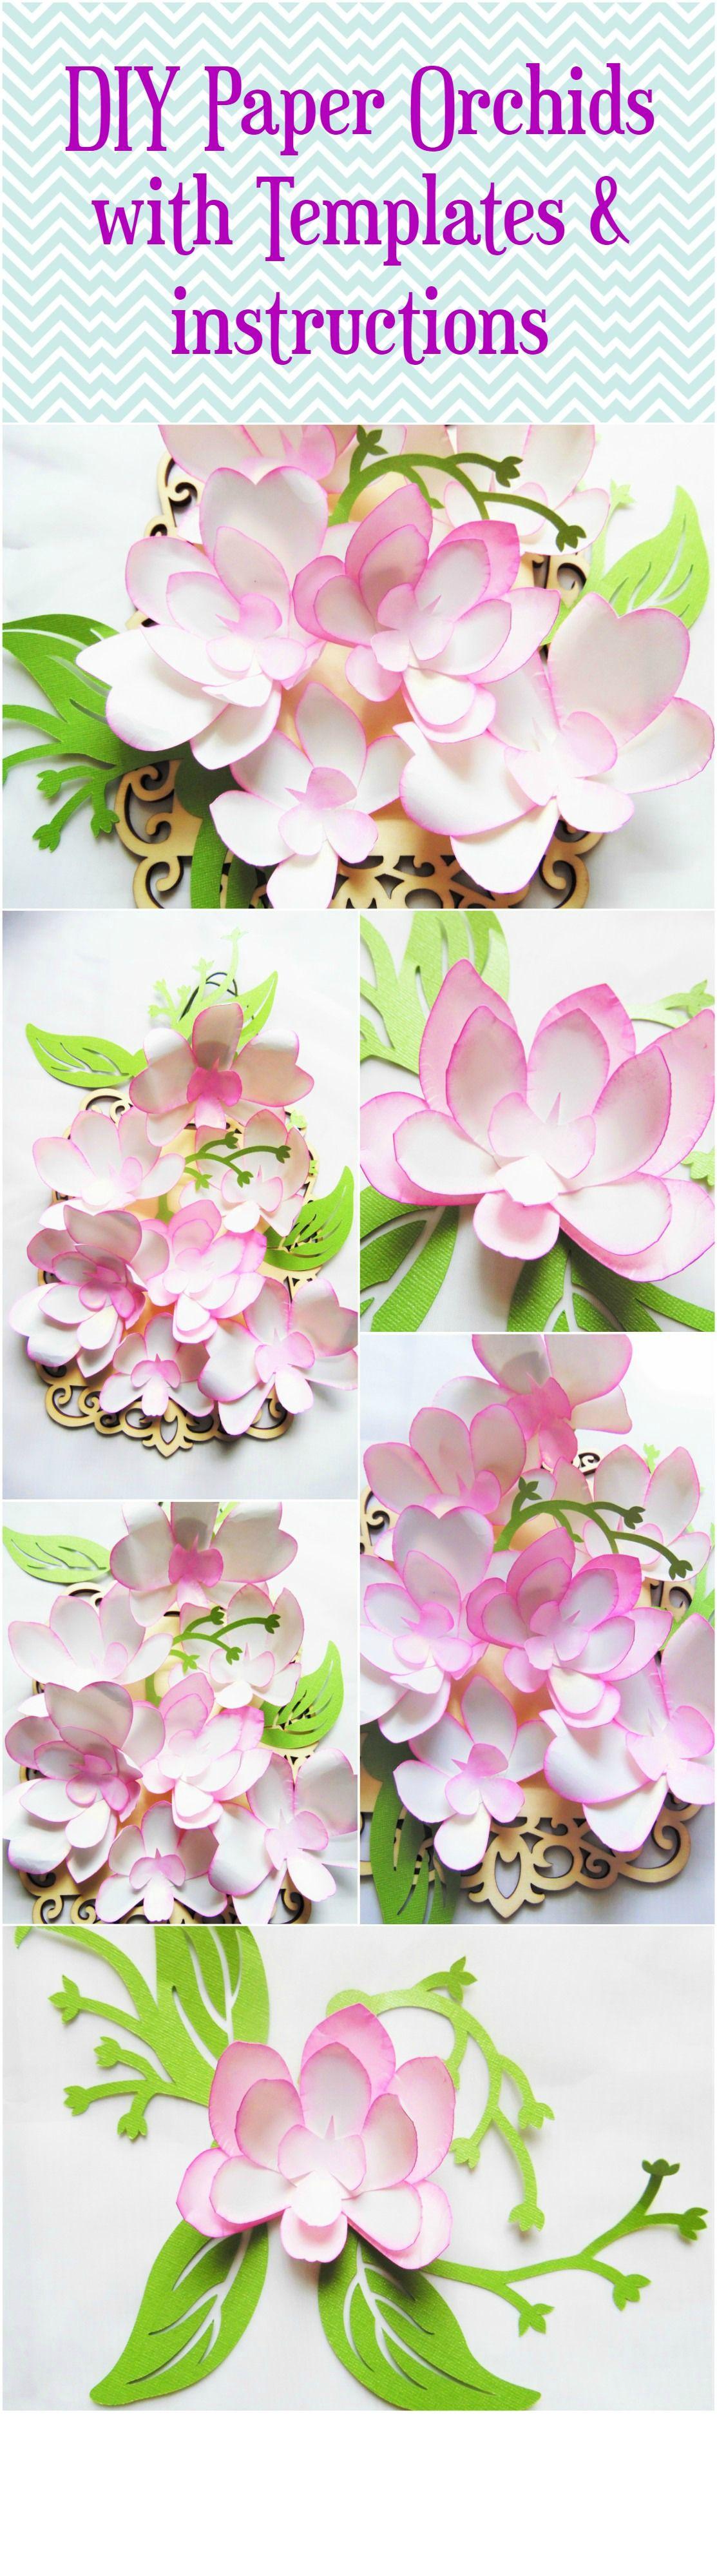 Diy paper flower wedding decorations  DIY Paper Flowers DIY Orchid paper flower templates Wedding Orchid